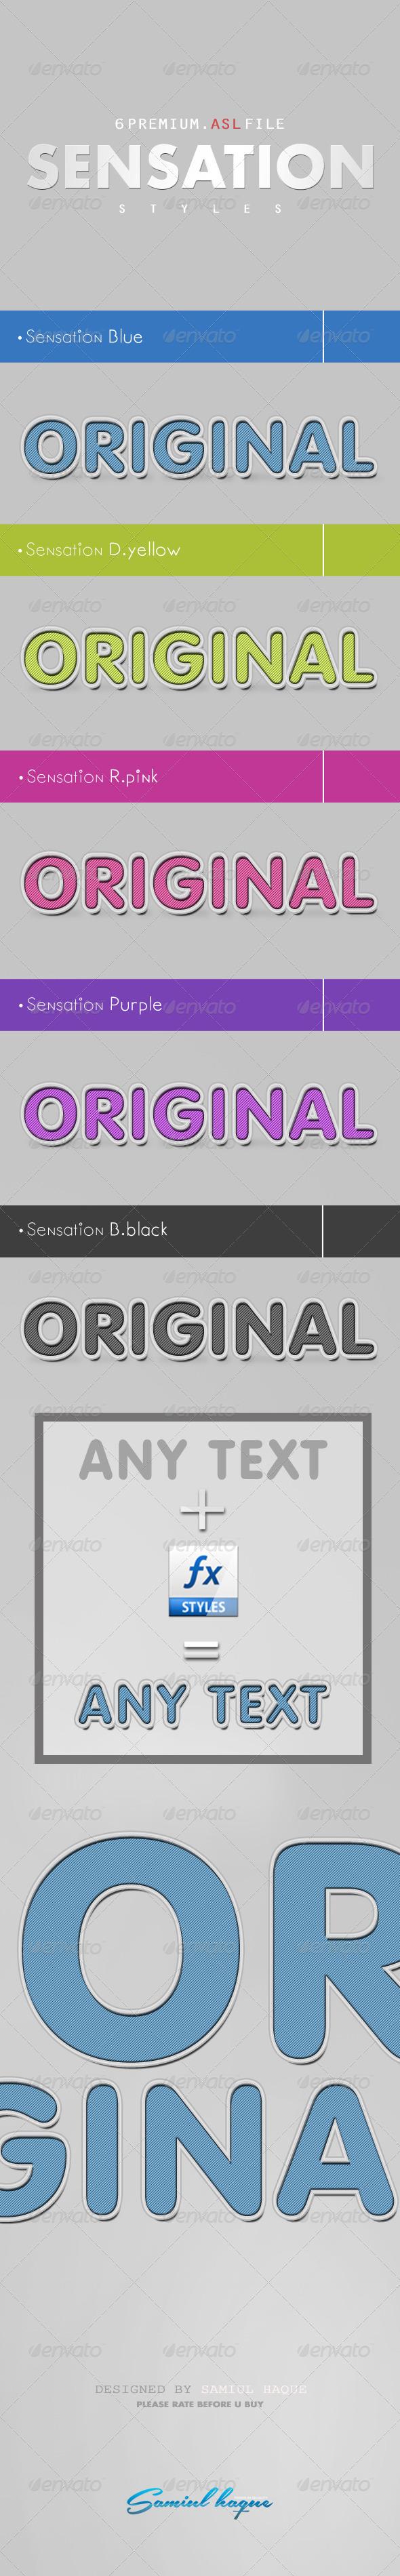 GraphicRiver 5 Sensation Styles Editable 4218747